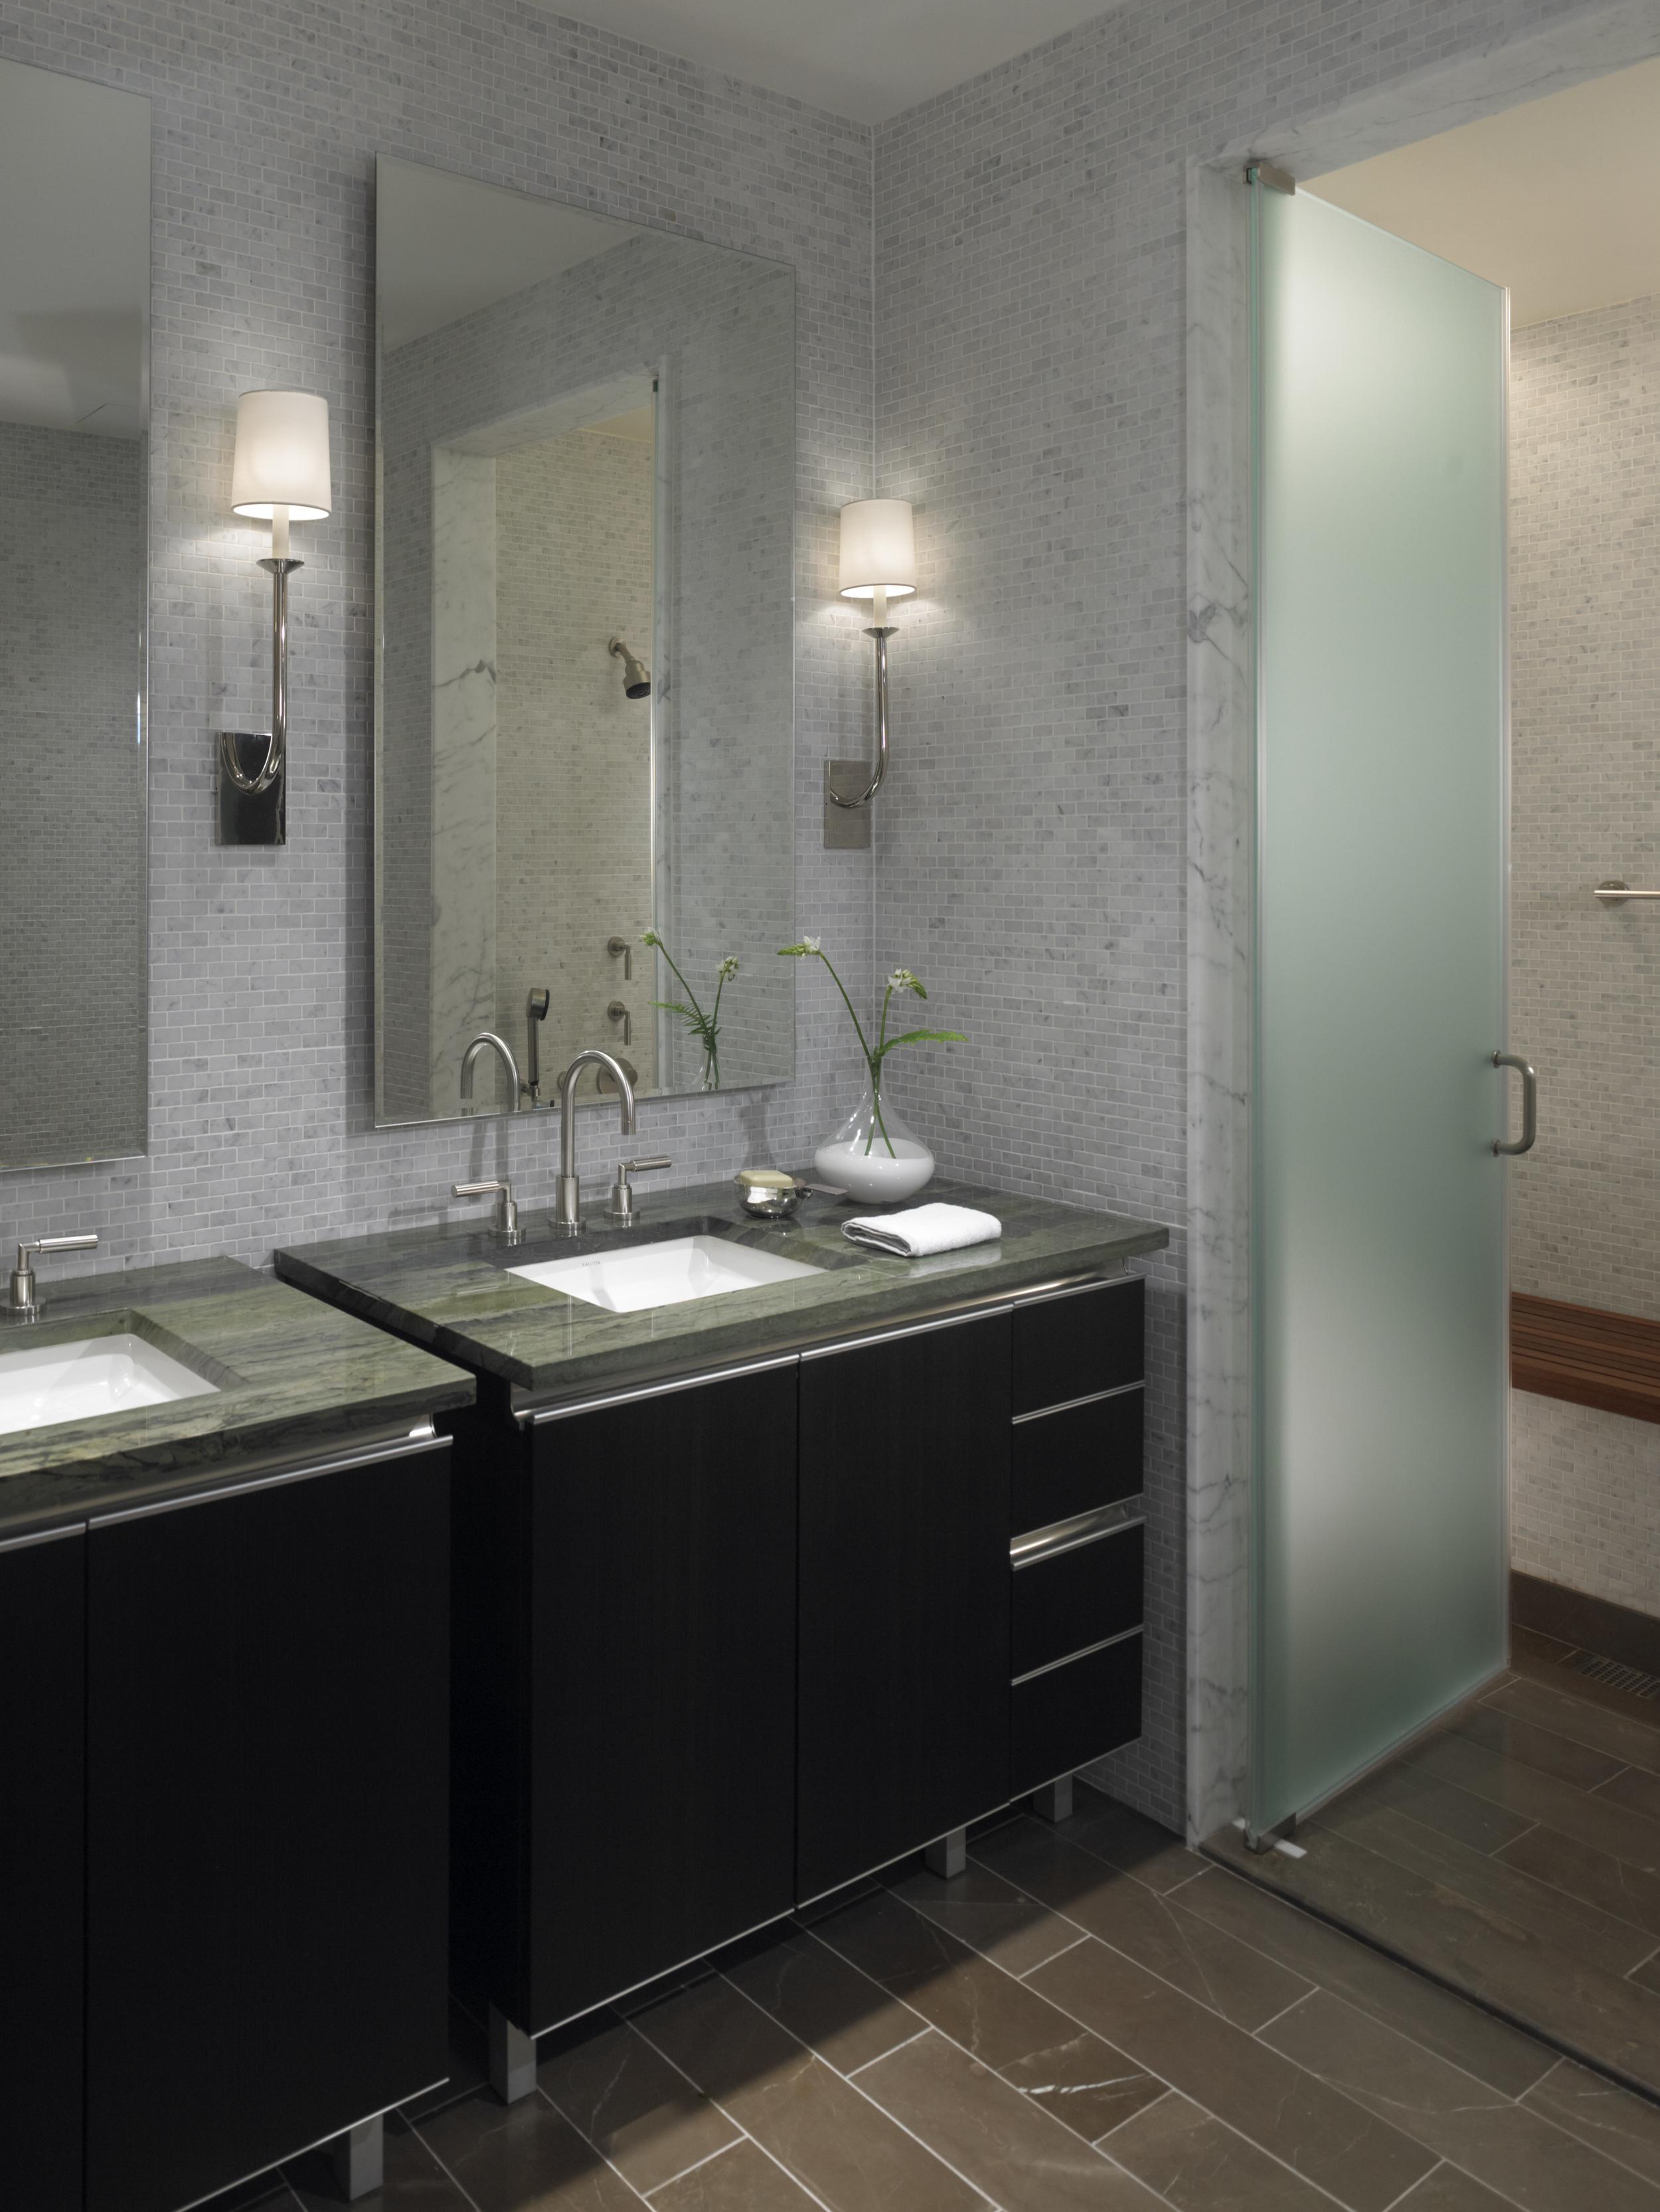 Kadlec Architecture + Design - Michigan Avenue Residence 8.jpg